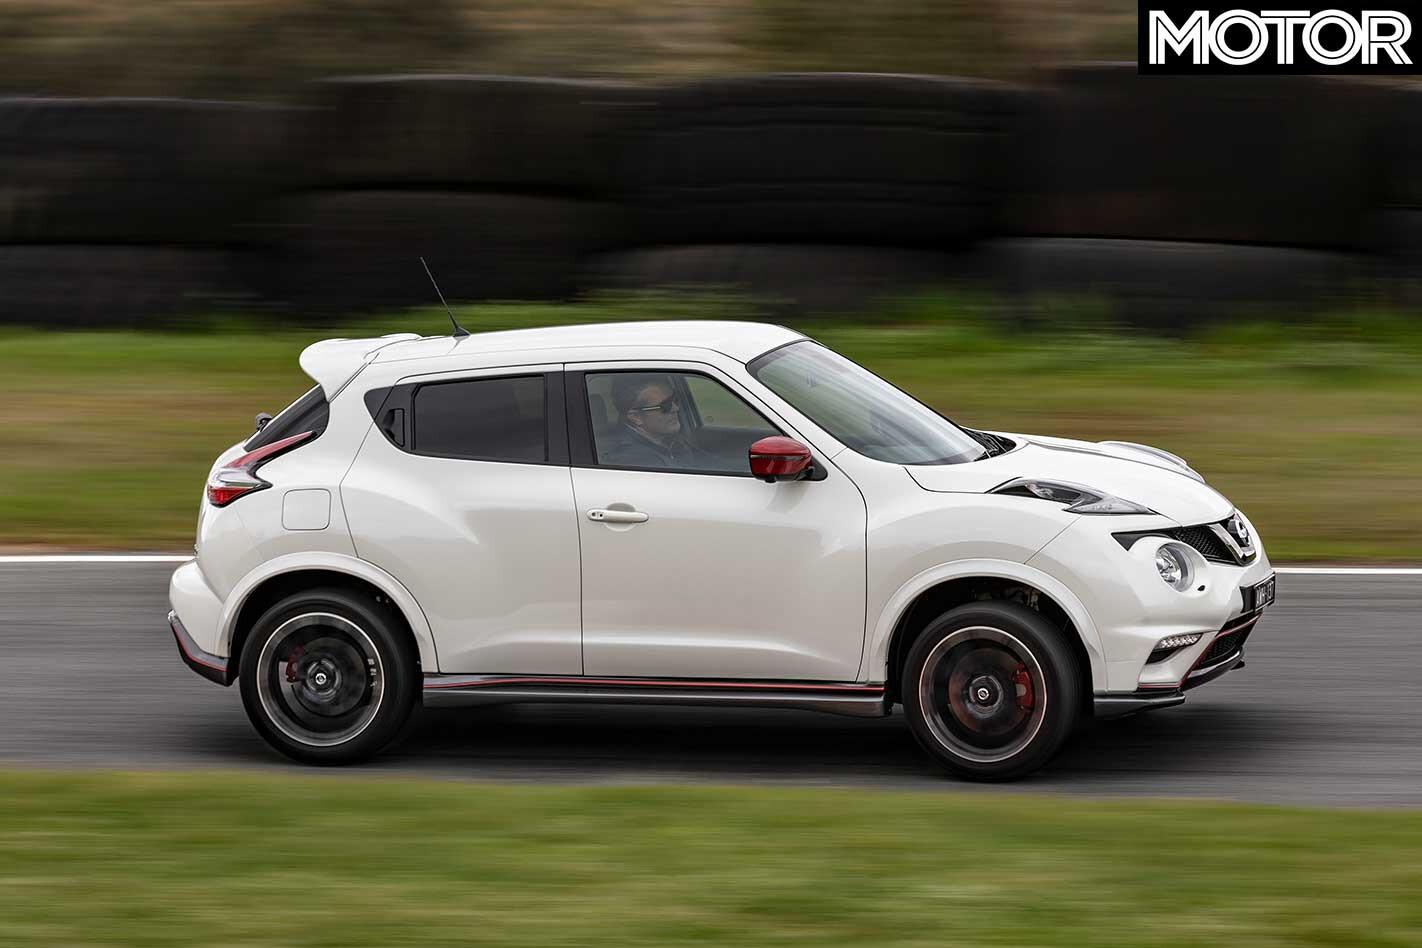 2018 Nissan Juke Nismo RS Side Profile Dynamic Jpg